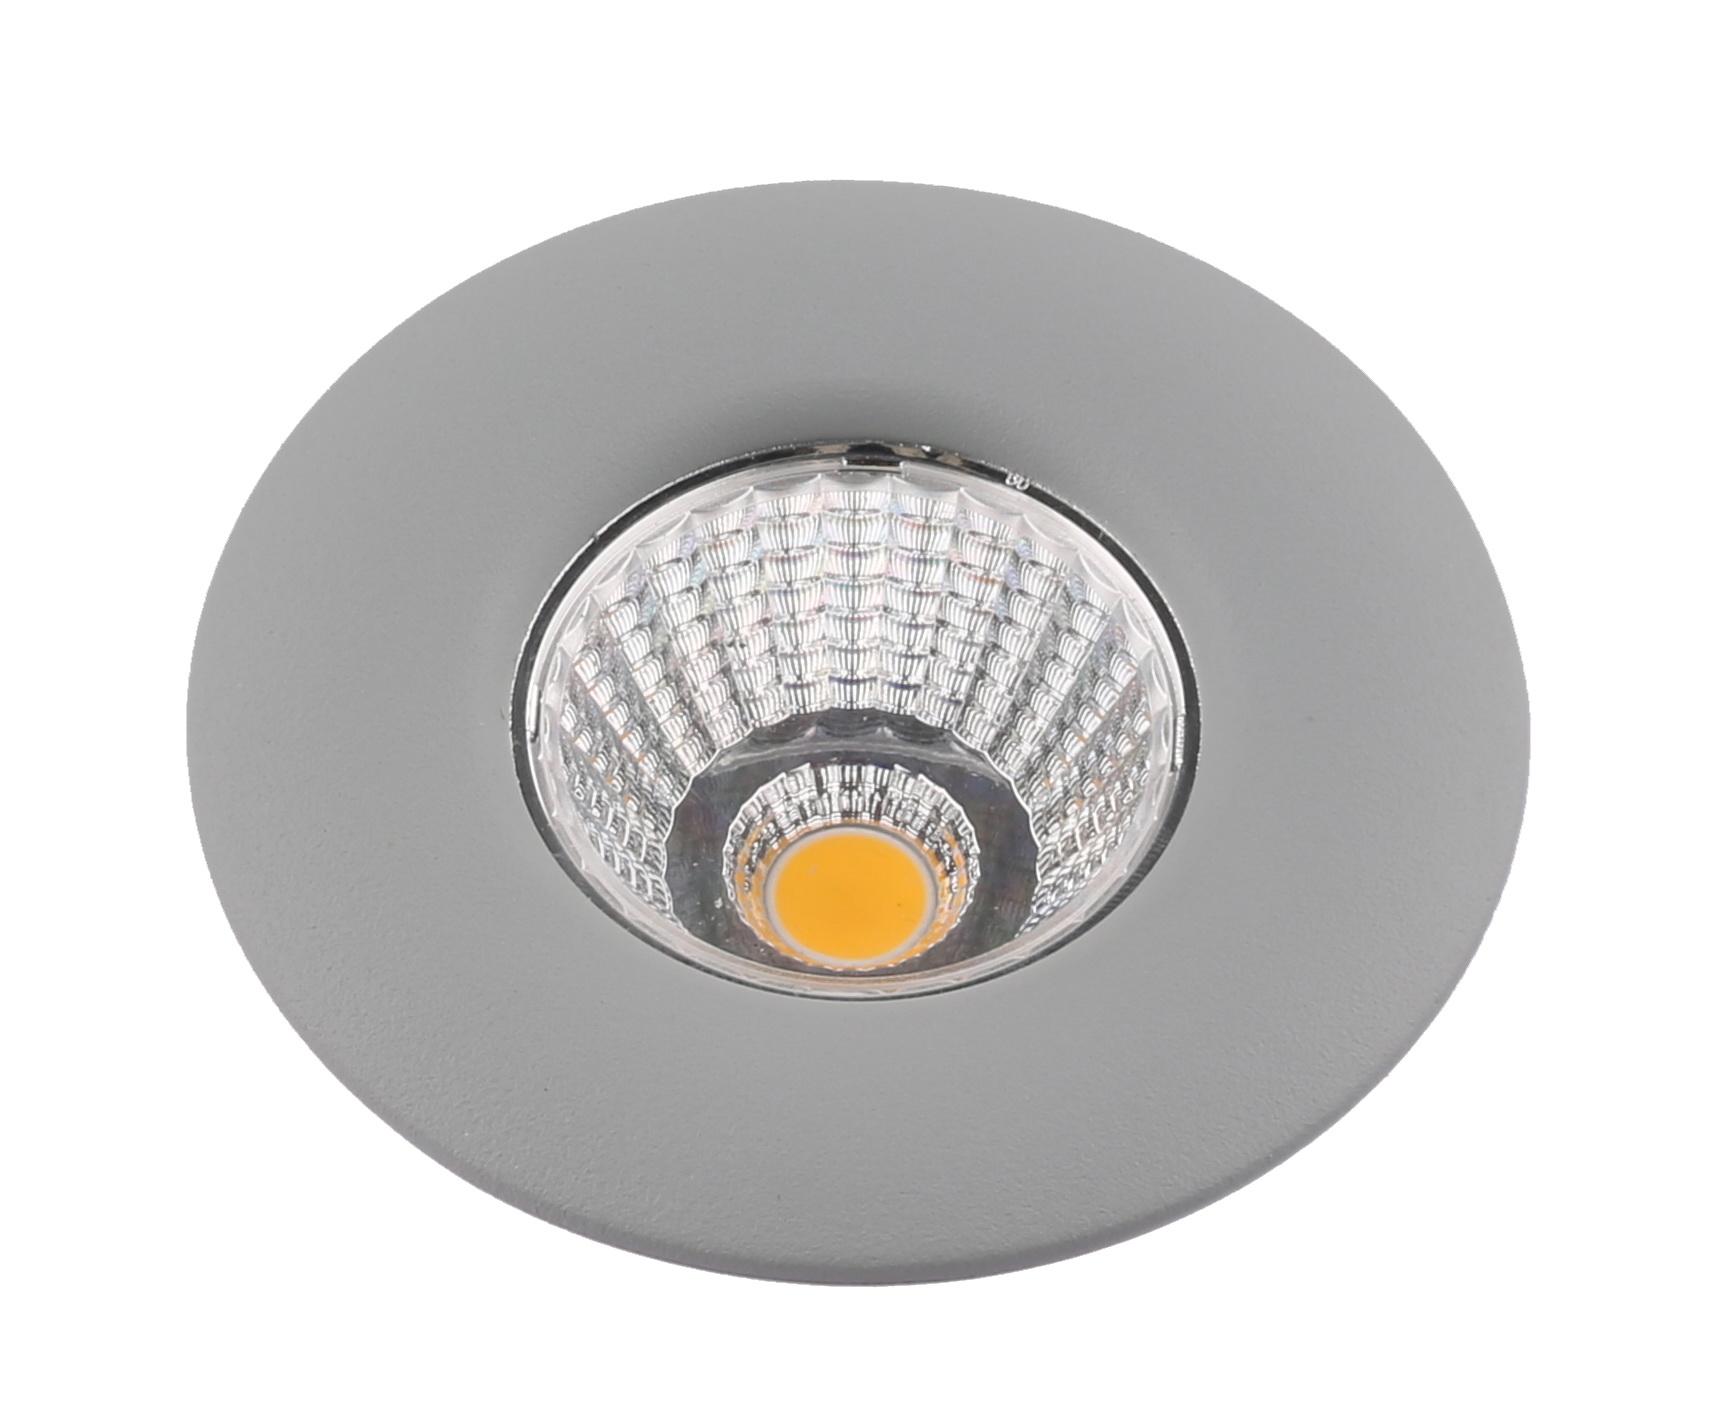 Фото товара A1425PL-1GY Arte Lamp